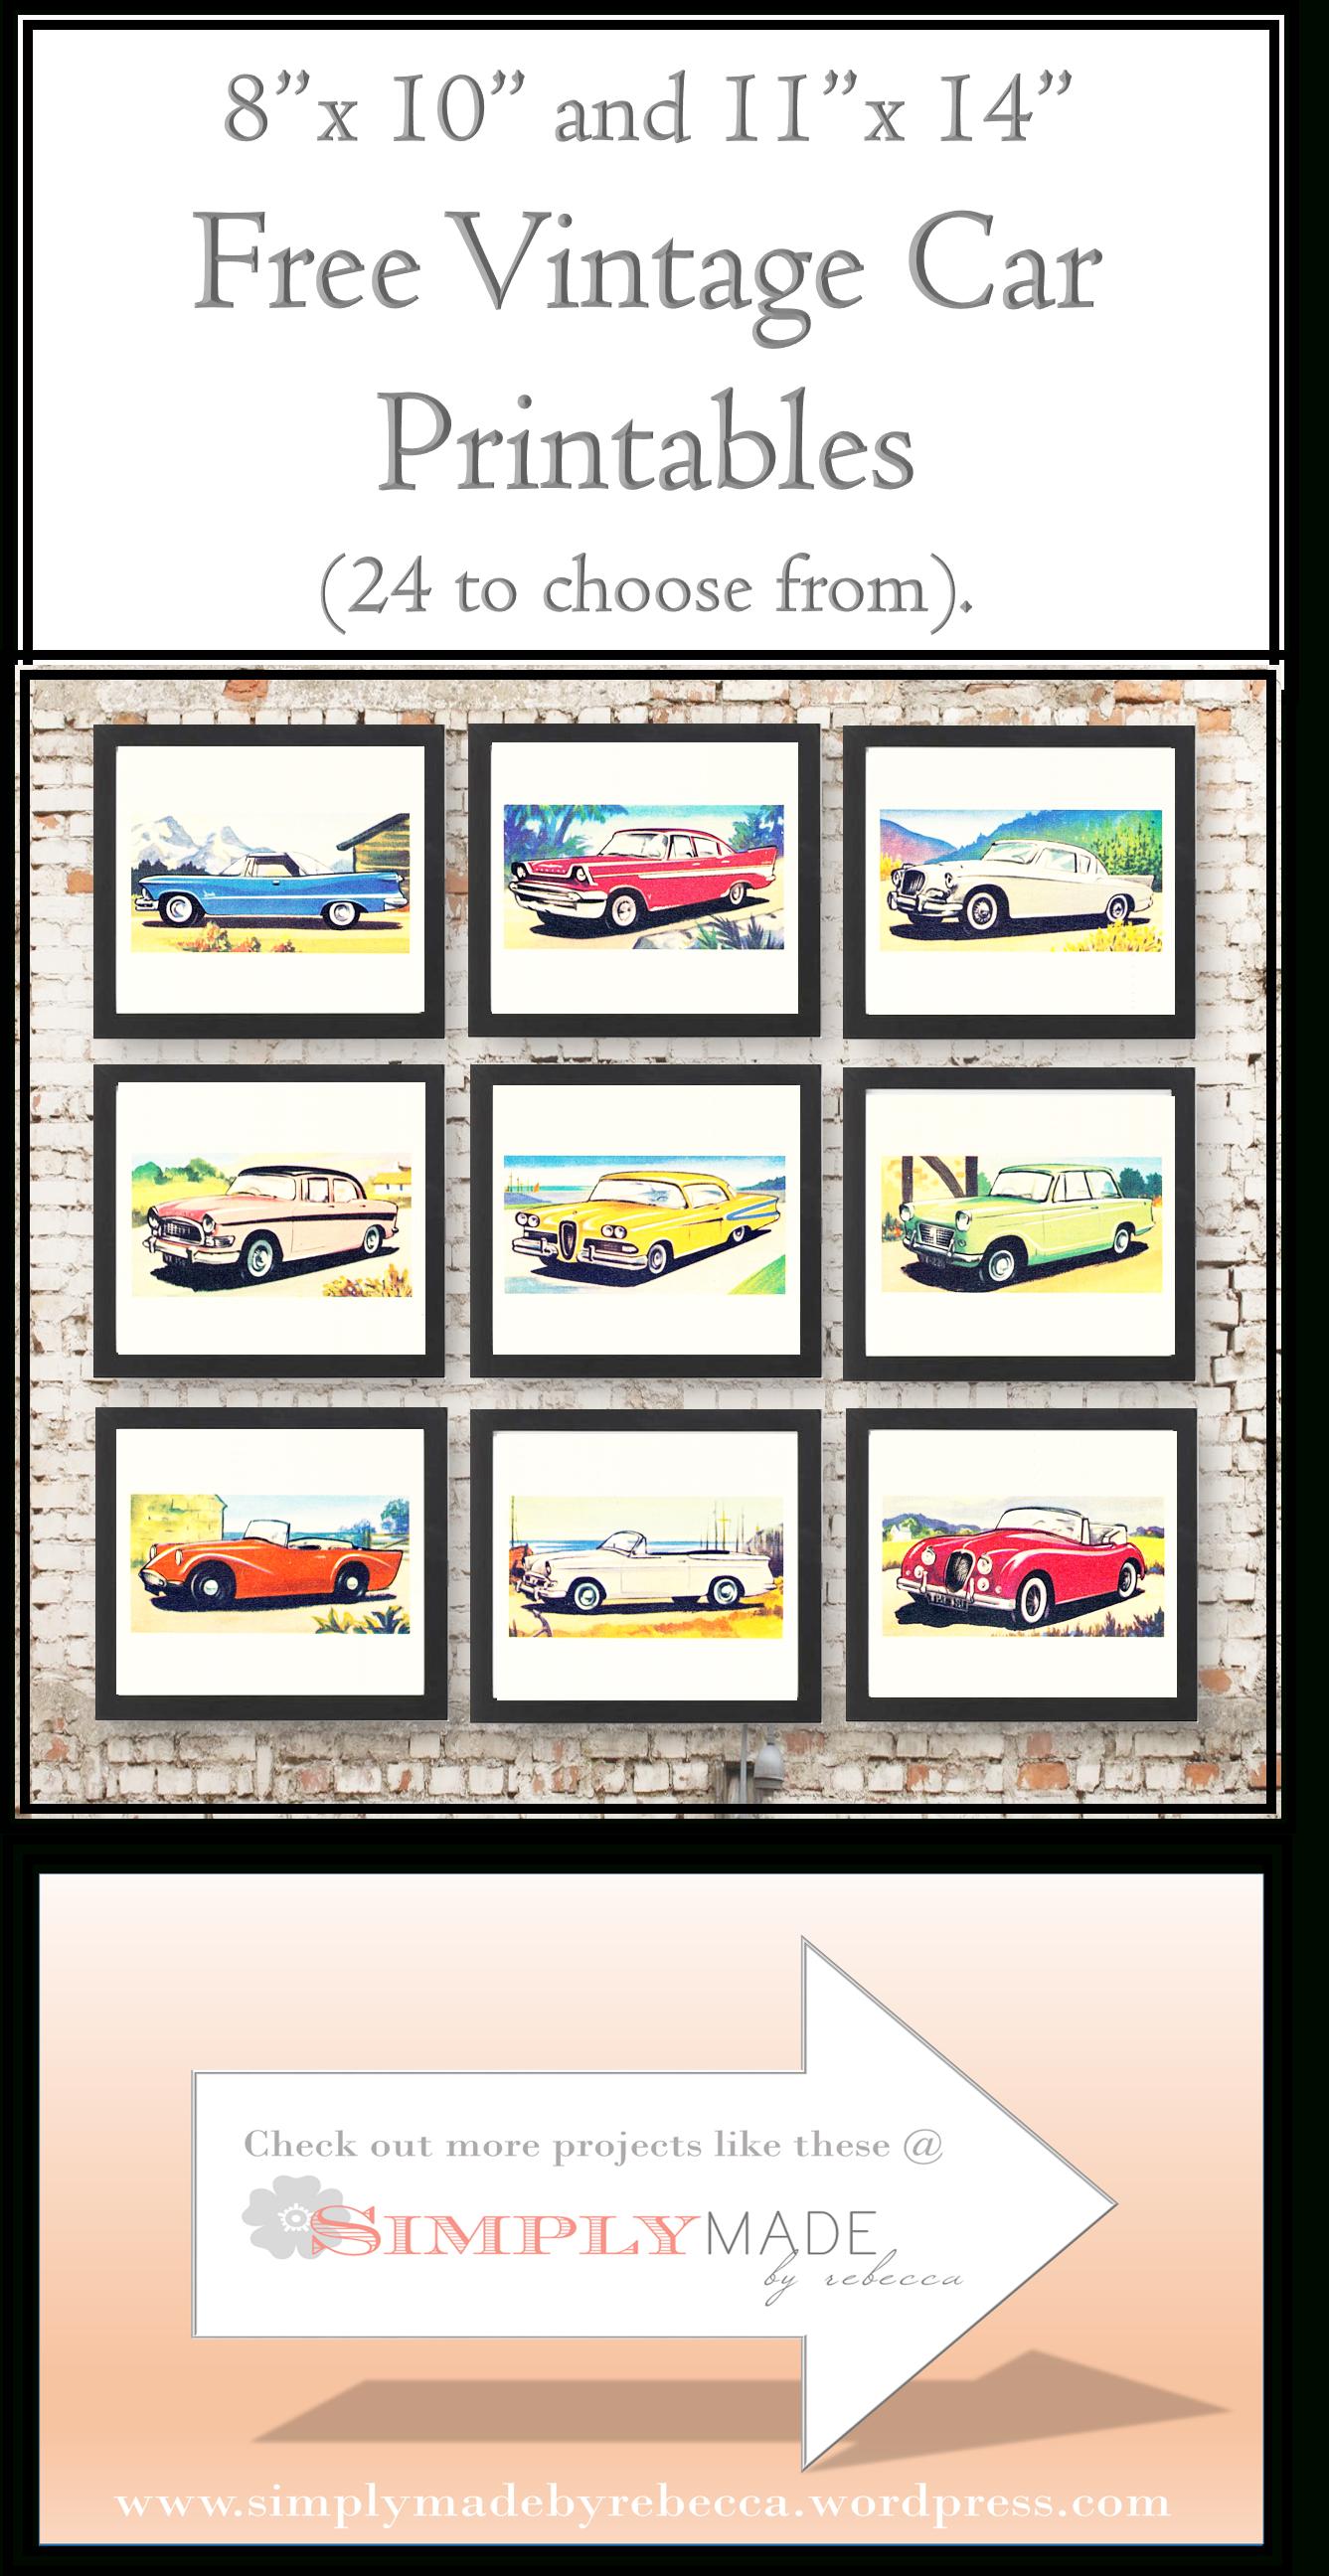 Free Vintage Car Printables   Cards - Downloadable Resources - Free - Free Printable Nursery Resources